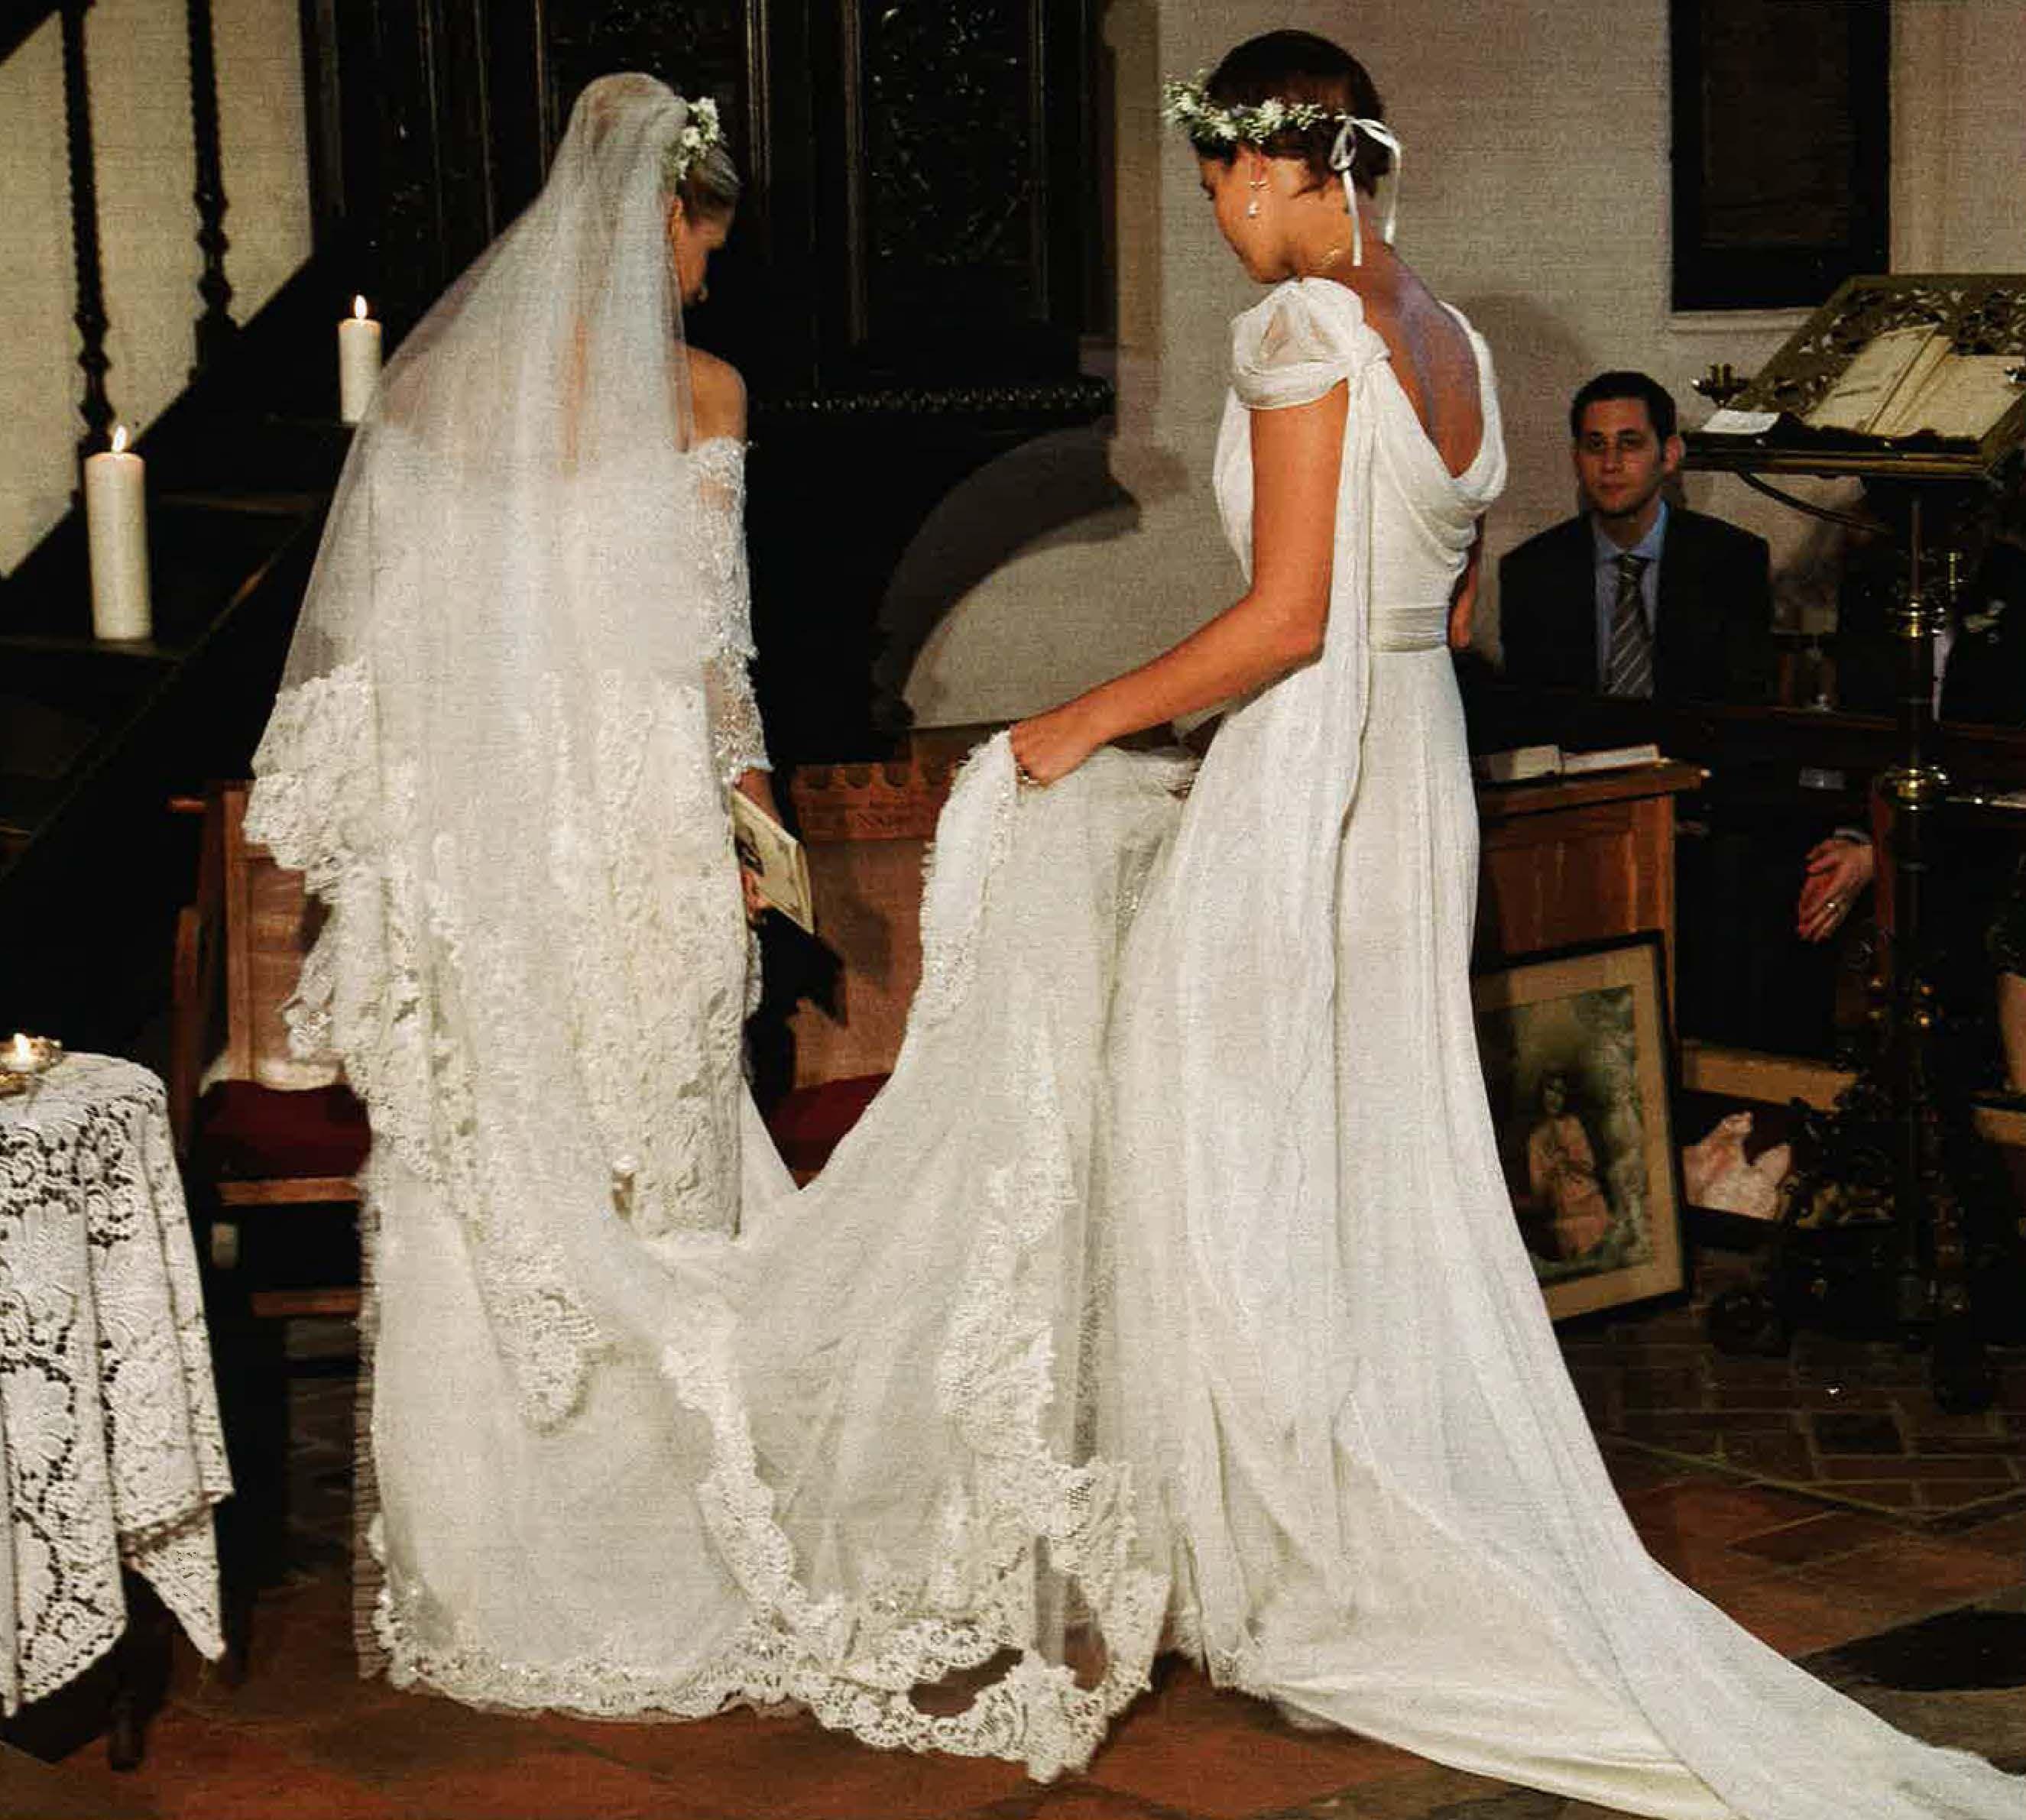 Peaches geldof wedding dress  Peaches Geldof in Alberta Ferretti special wedding dress